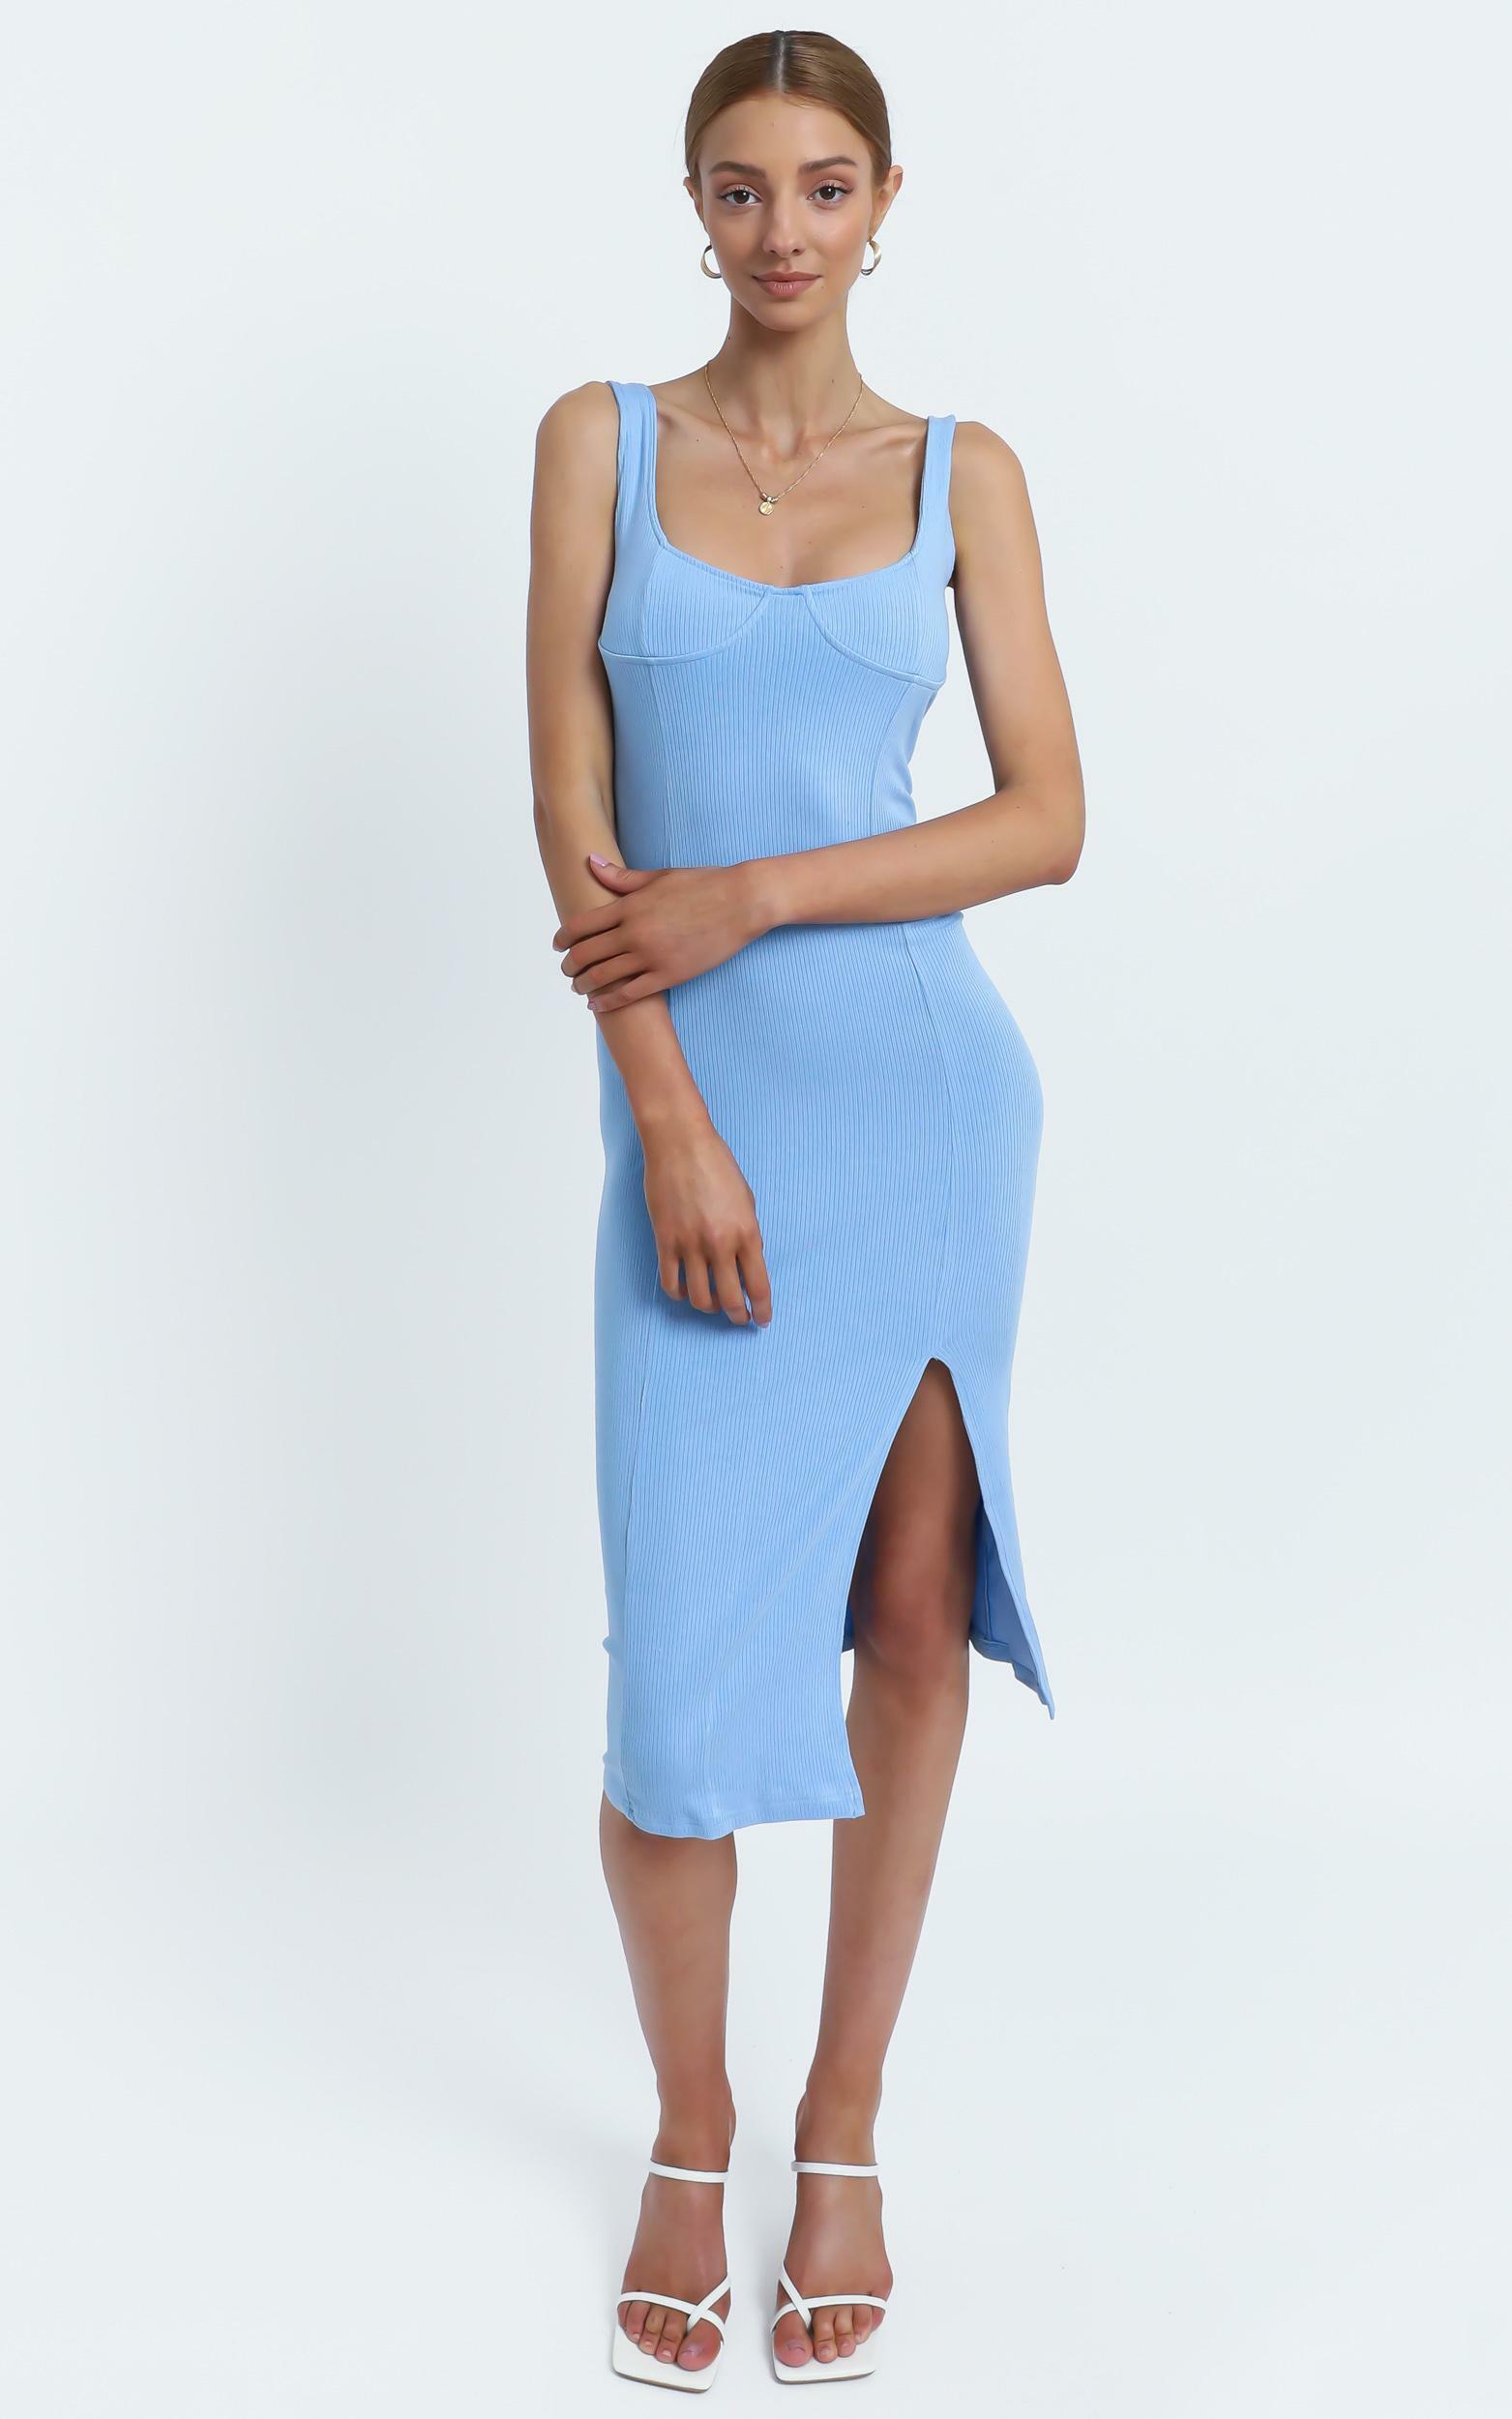 Bliss Dress in Blue - 12 (L), Blue, hi-res image number null